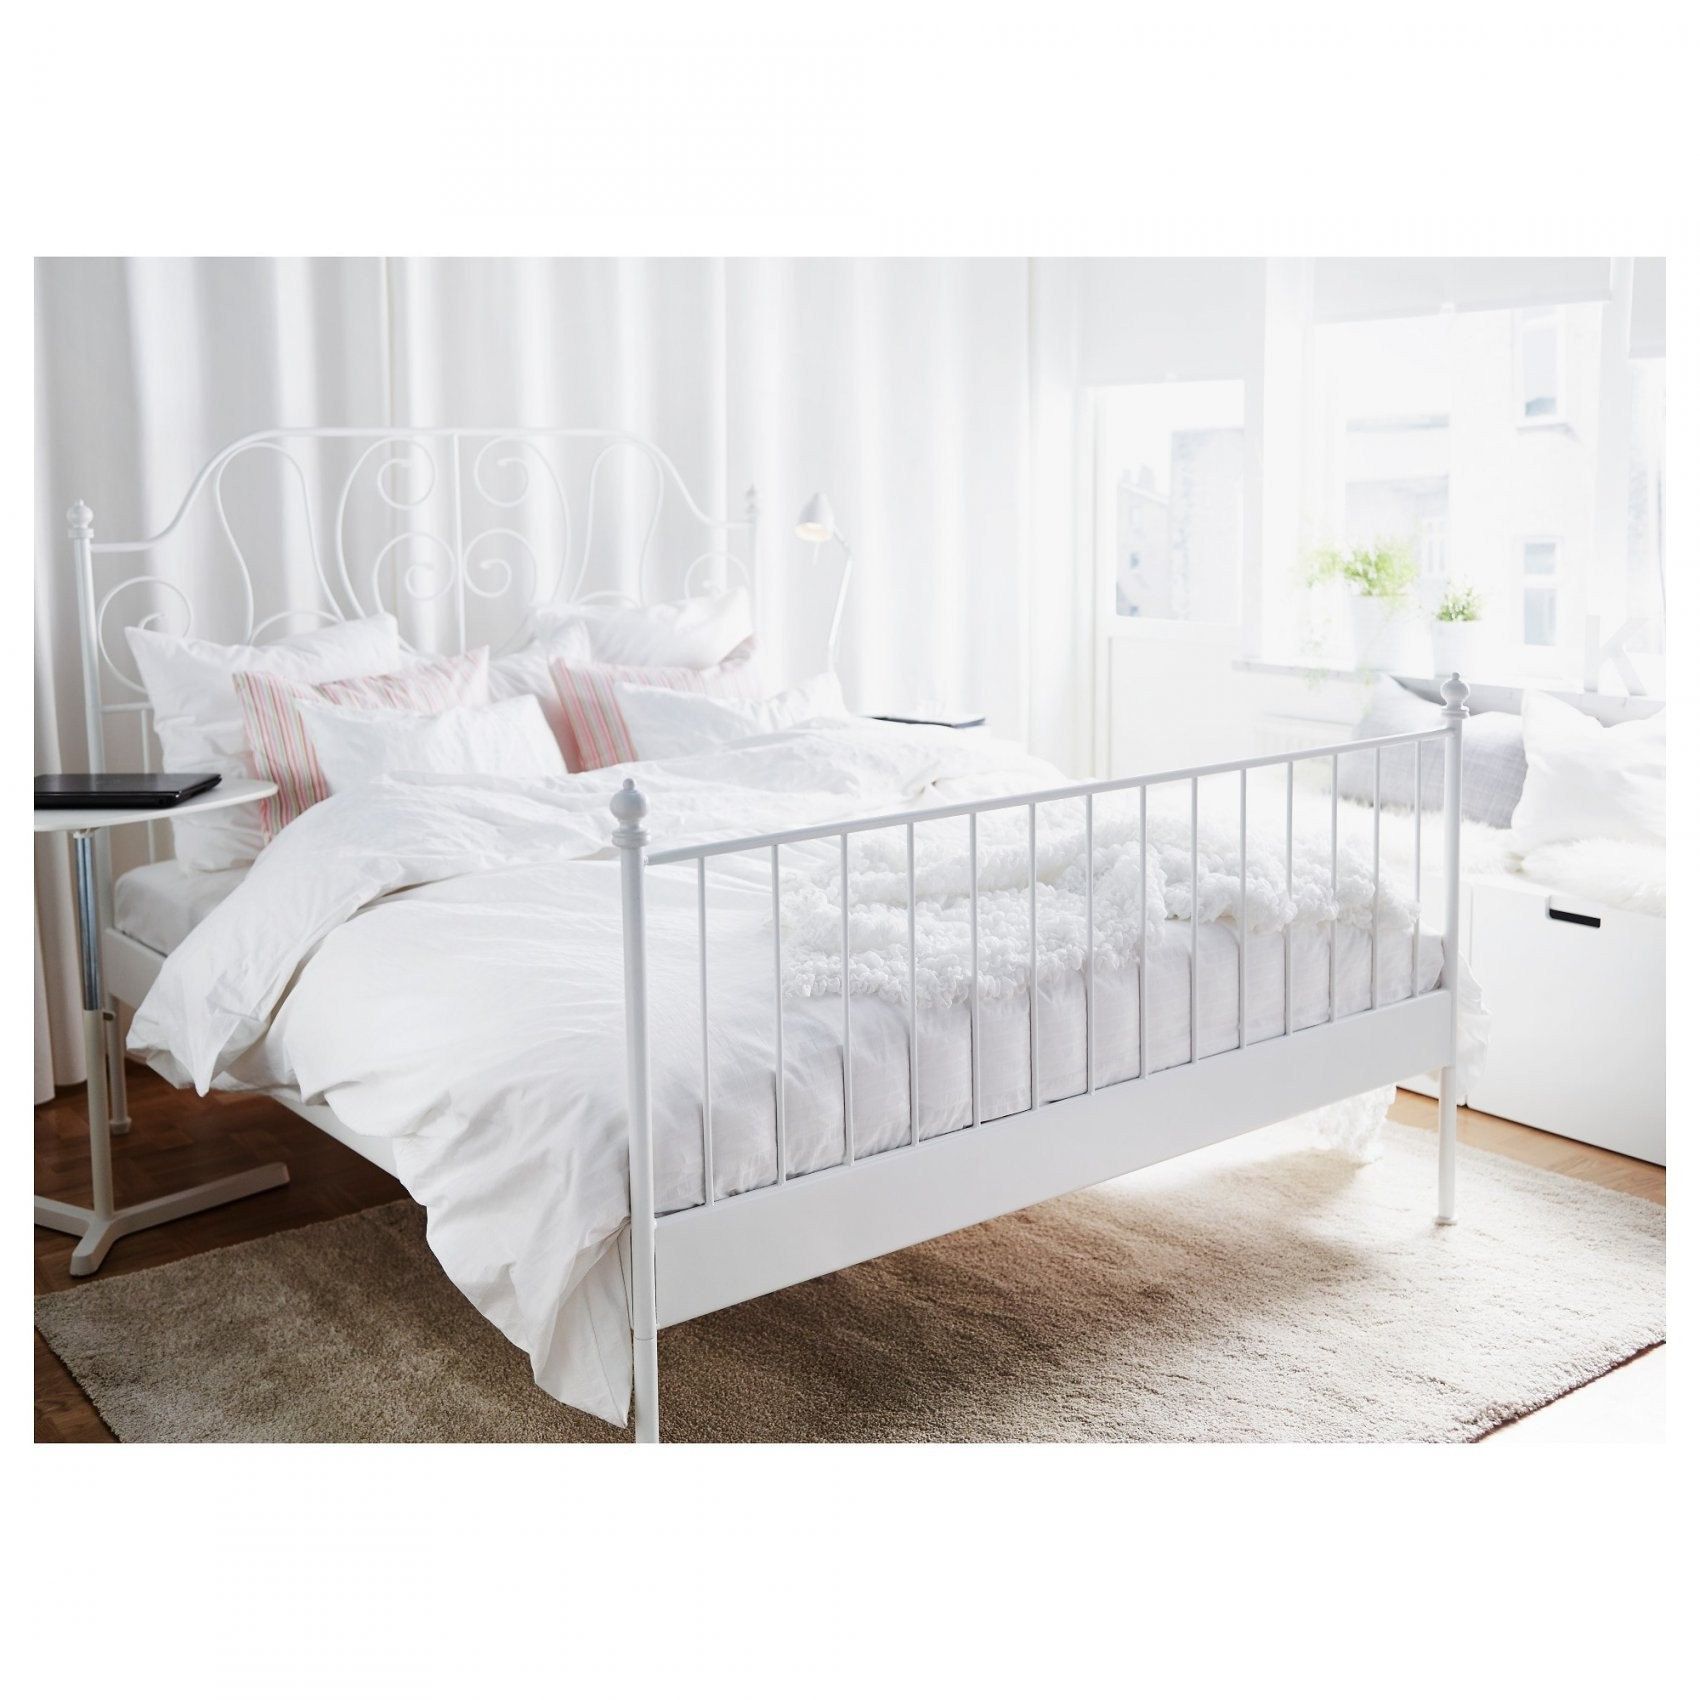 Leirvik Bettgestell  140X200 Cm   Ikea von Mädchen Bett 140X200 Bild